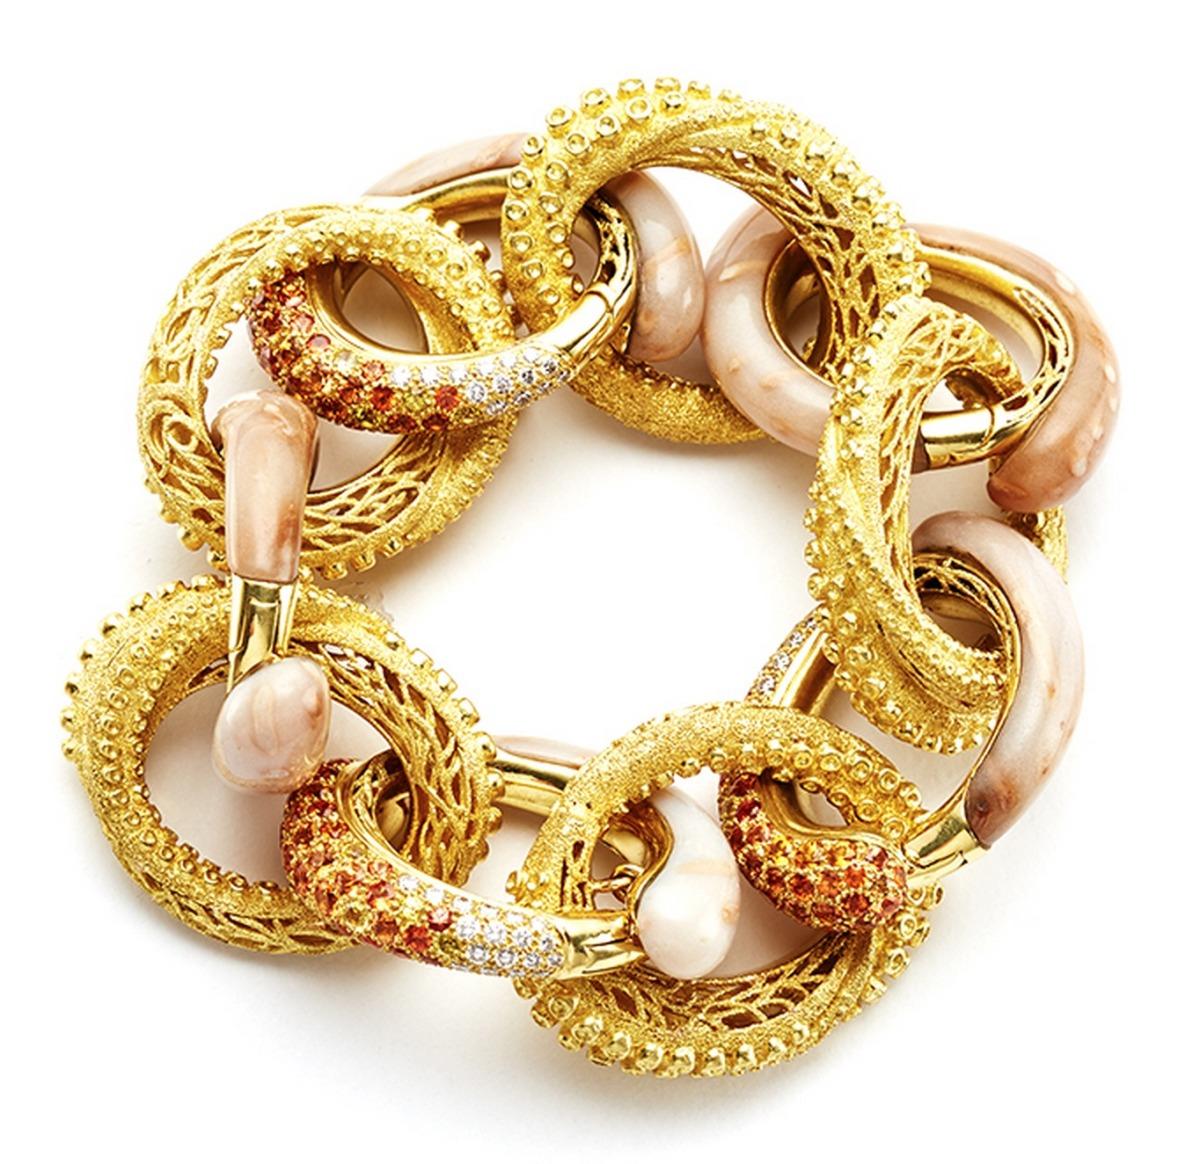 Palm Tree Ring Jewelry